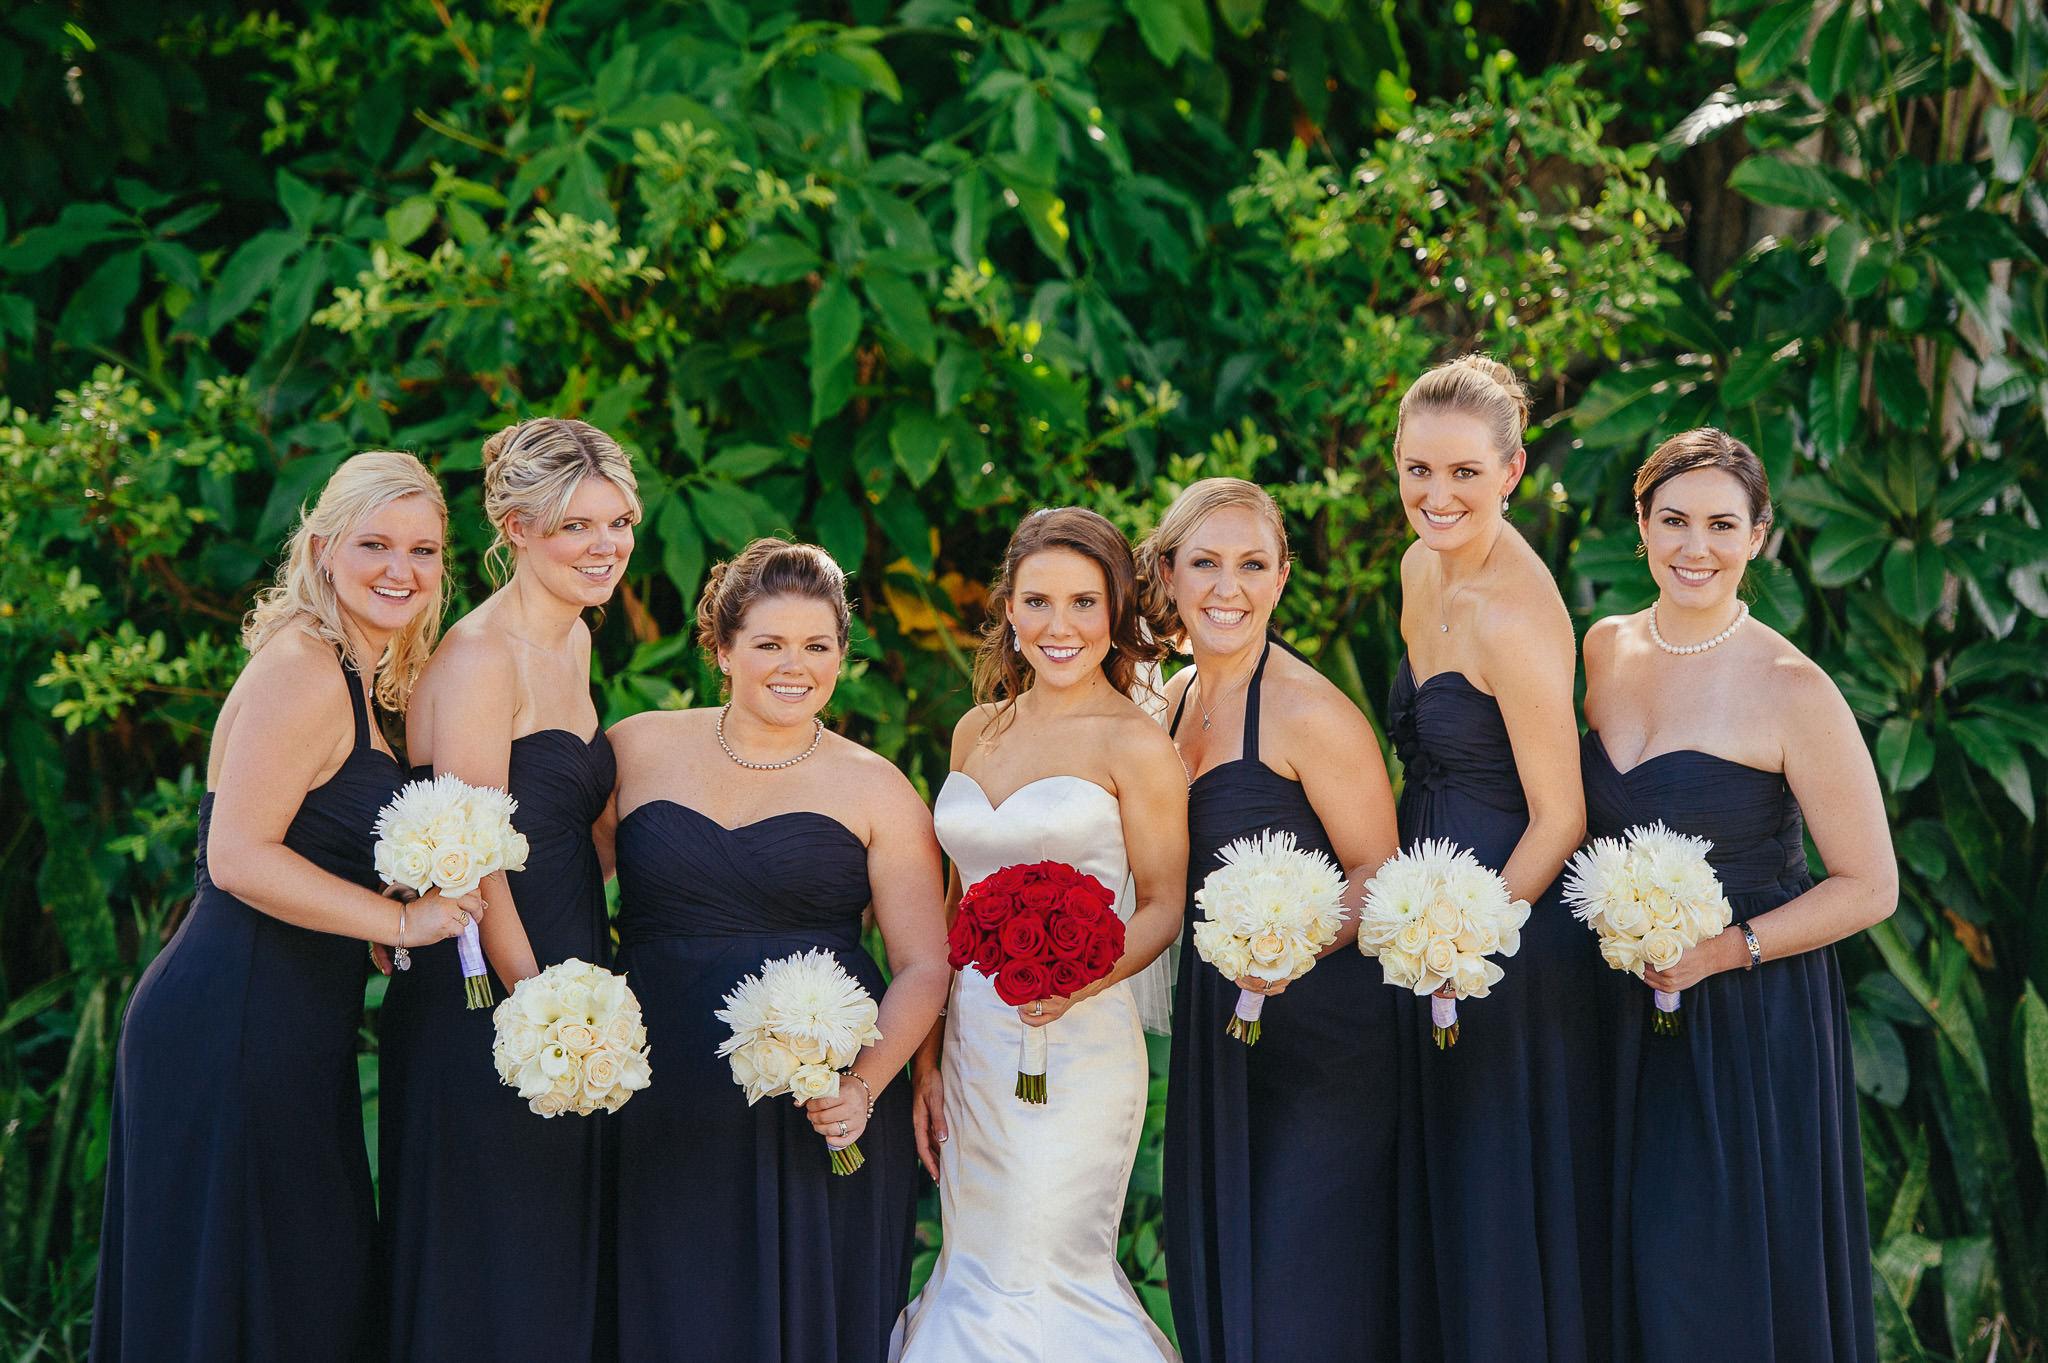 Long Black Bridesmaids Dresses